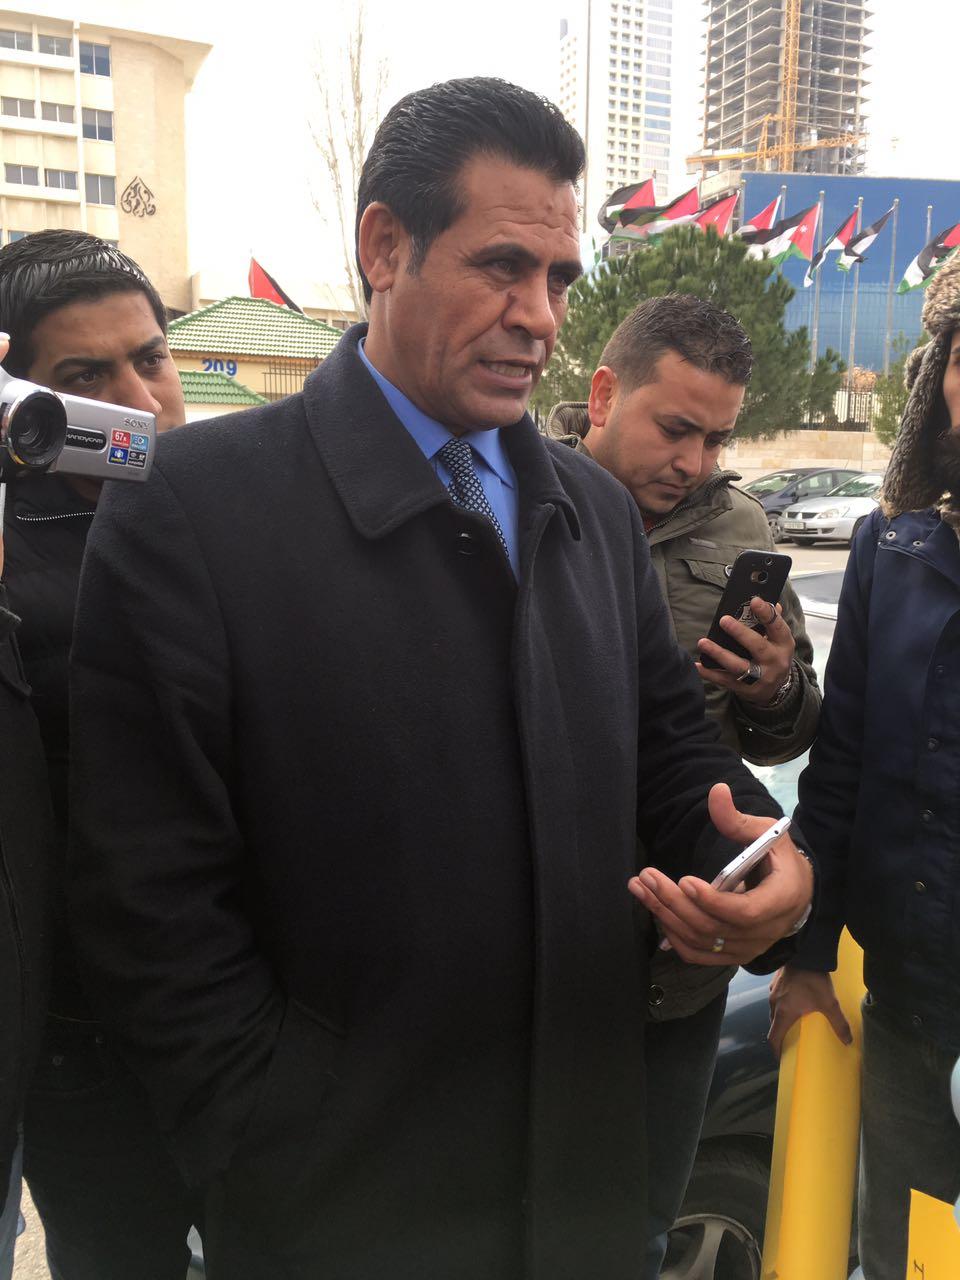 MP Suleiman Huwailah al-Zabn addressing activists. Photo by Nora B.